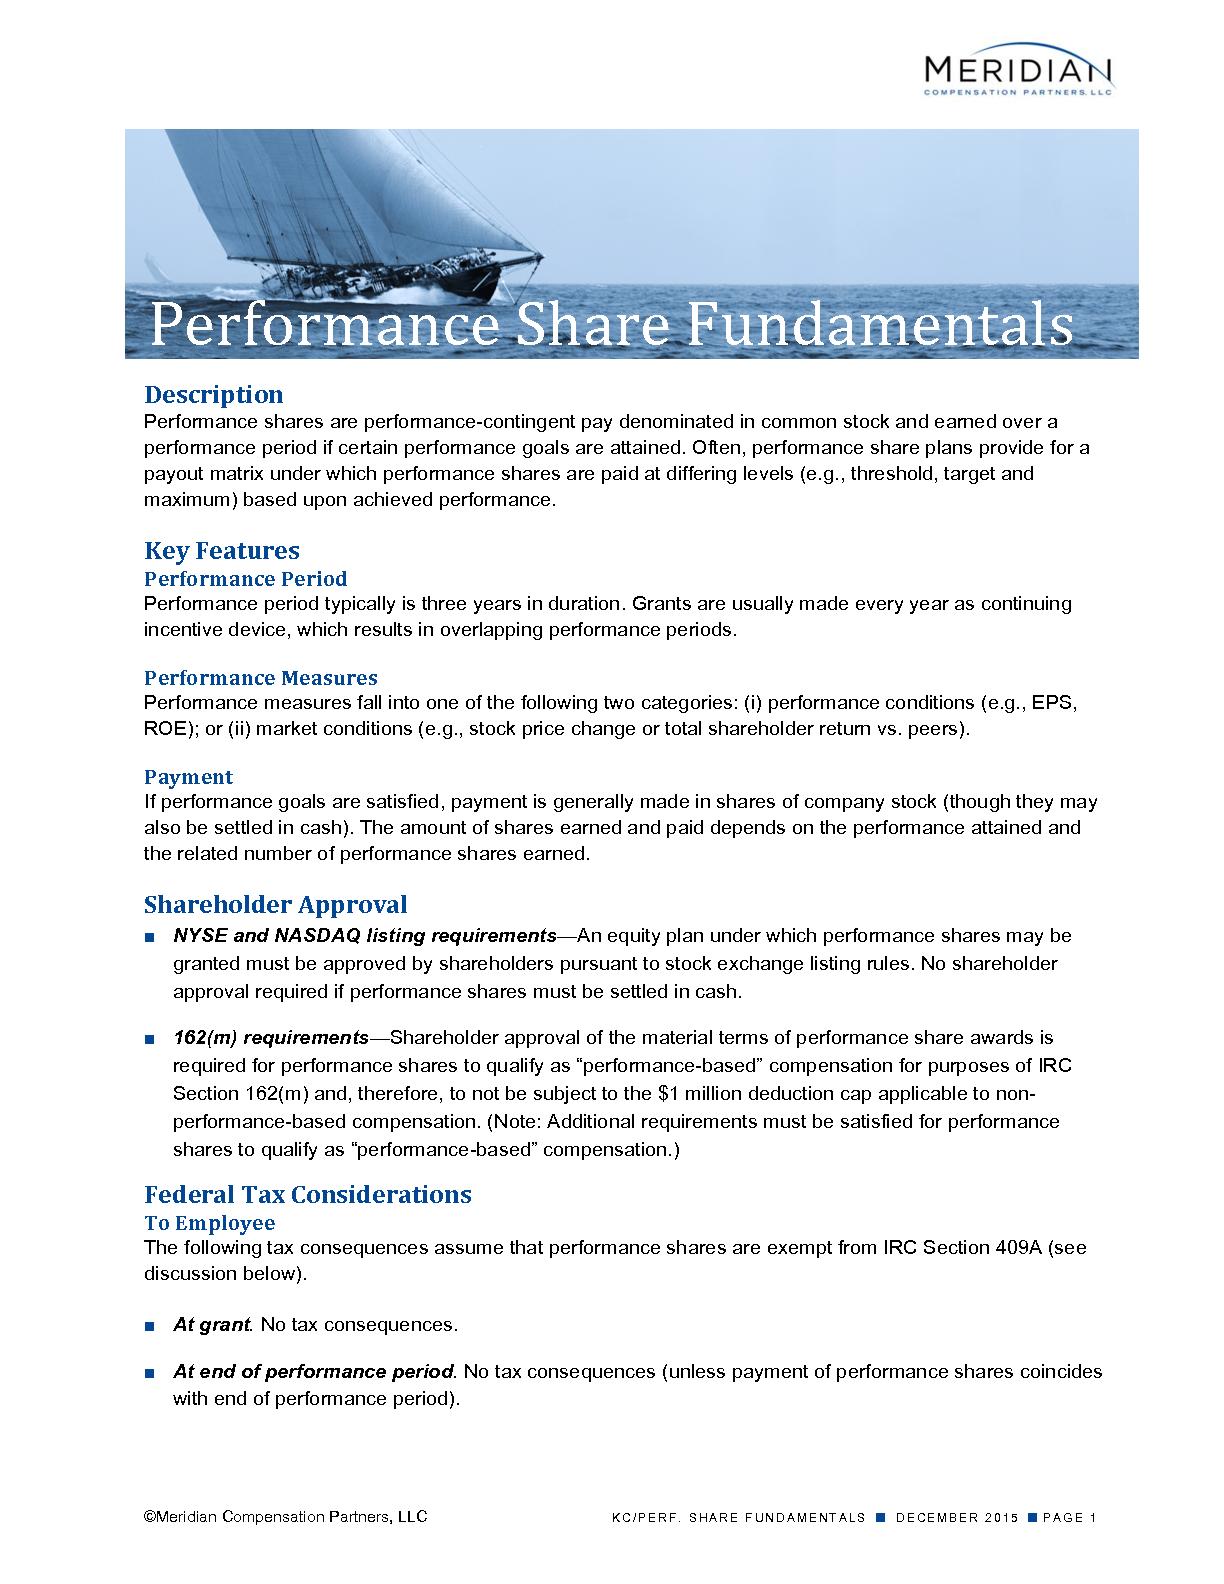 Performance Share Fundamentals (PDF)